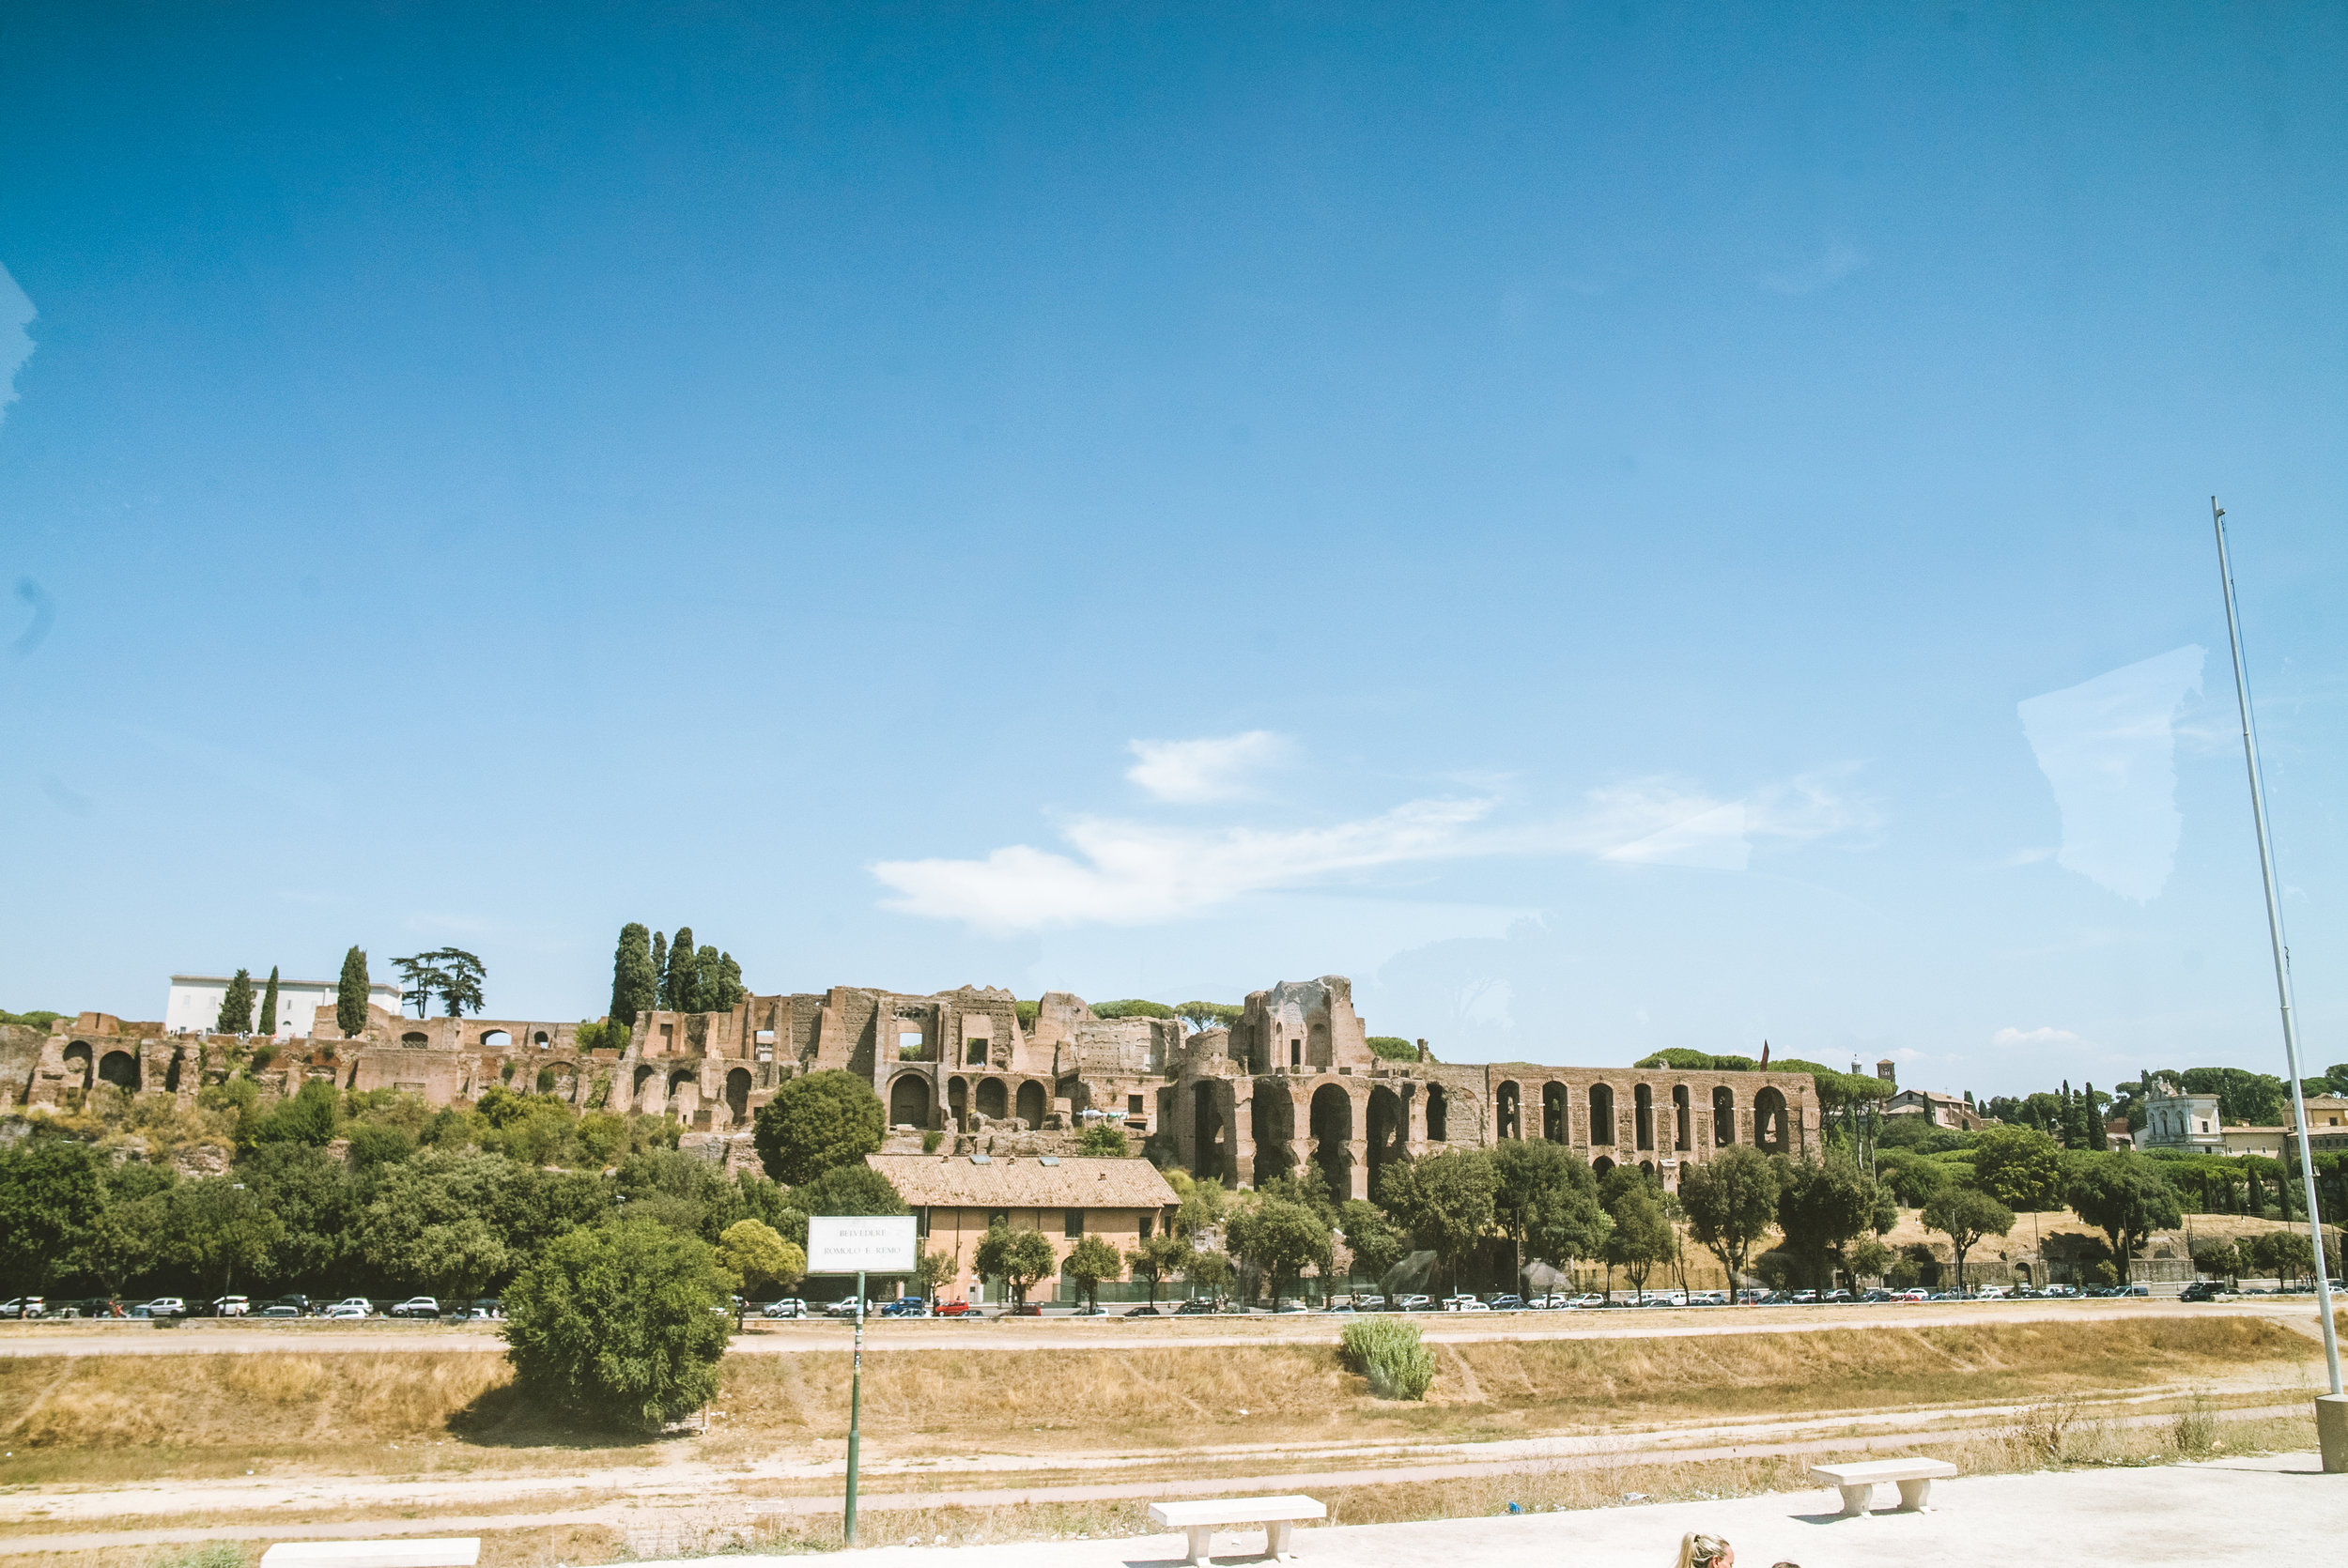 rome, italy photos